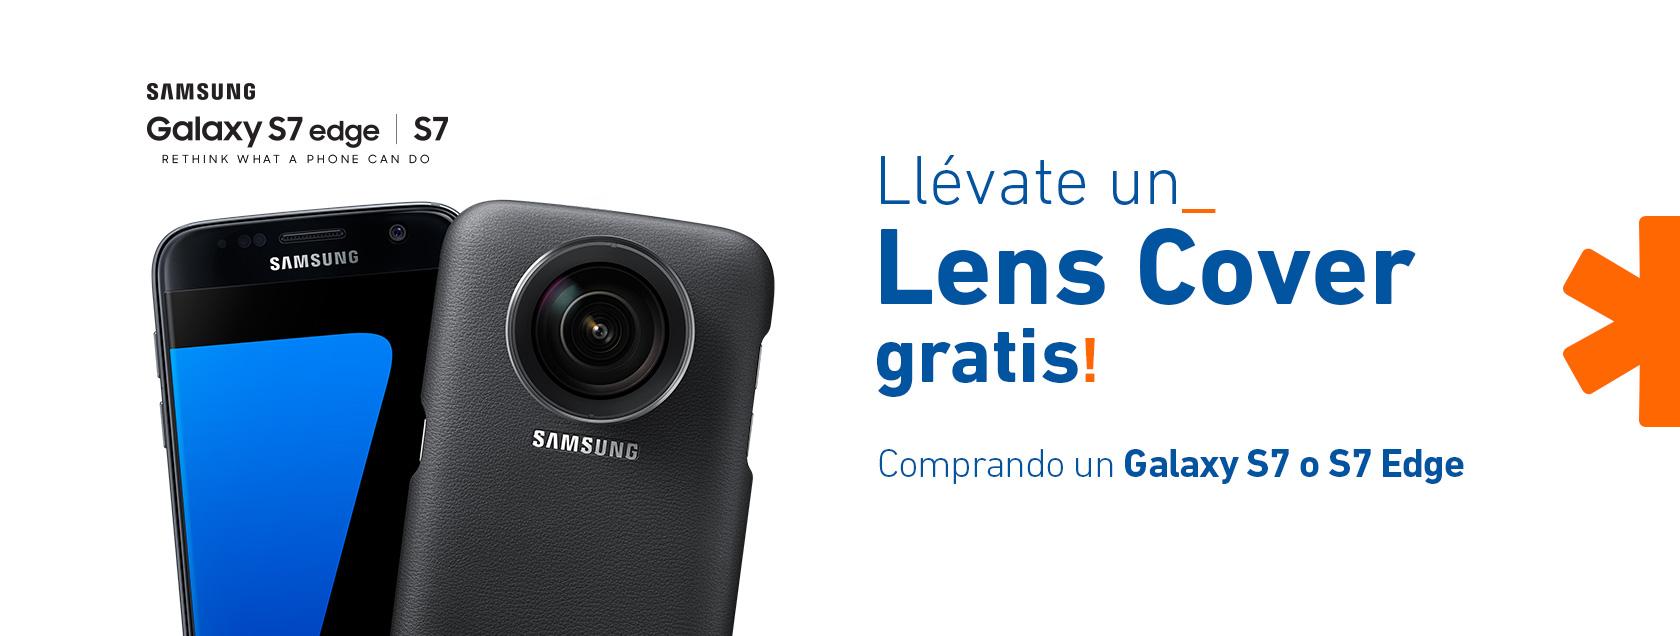 Por la compra de un Galaxy S7 o S7 Edge, llévate gratis un Lens Cover